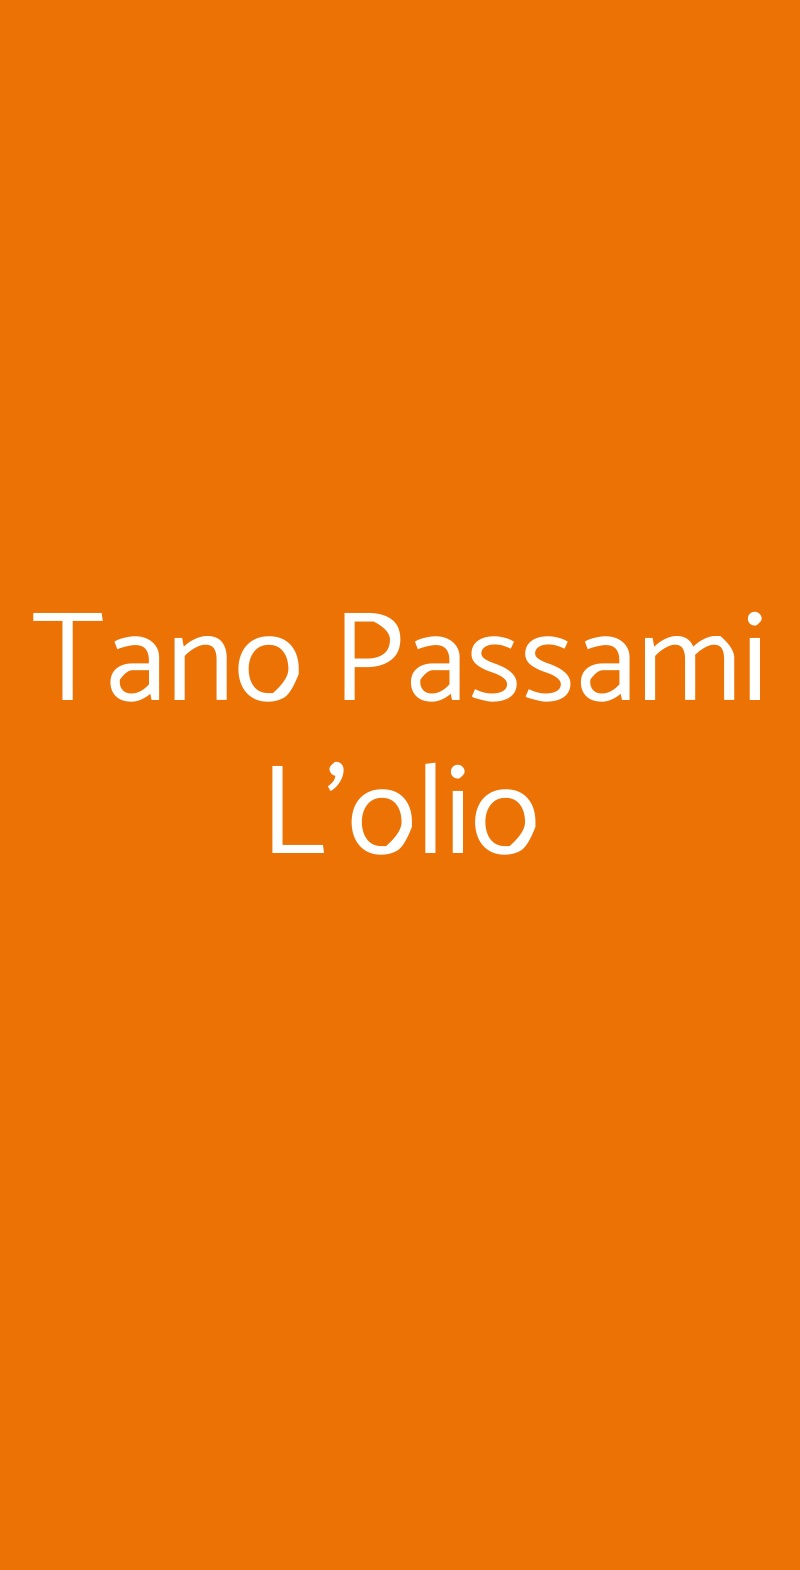 Tano Passami L'olio Milano menù 1 pagina